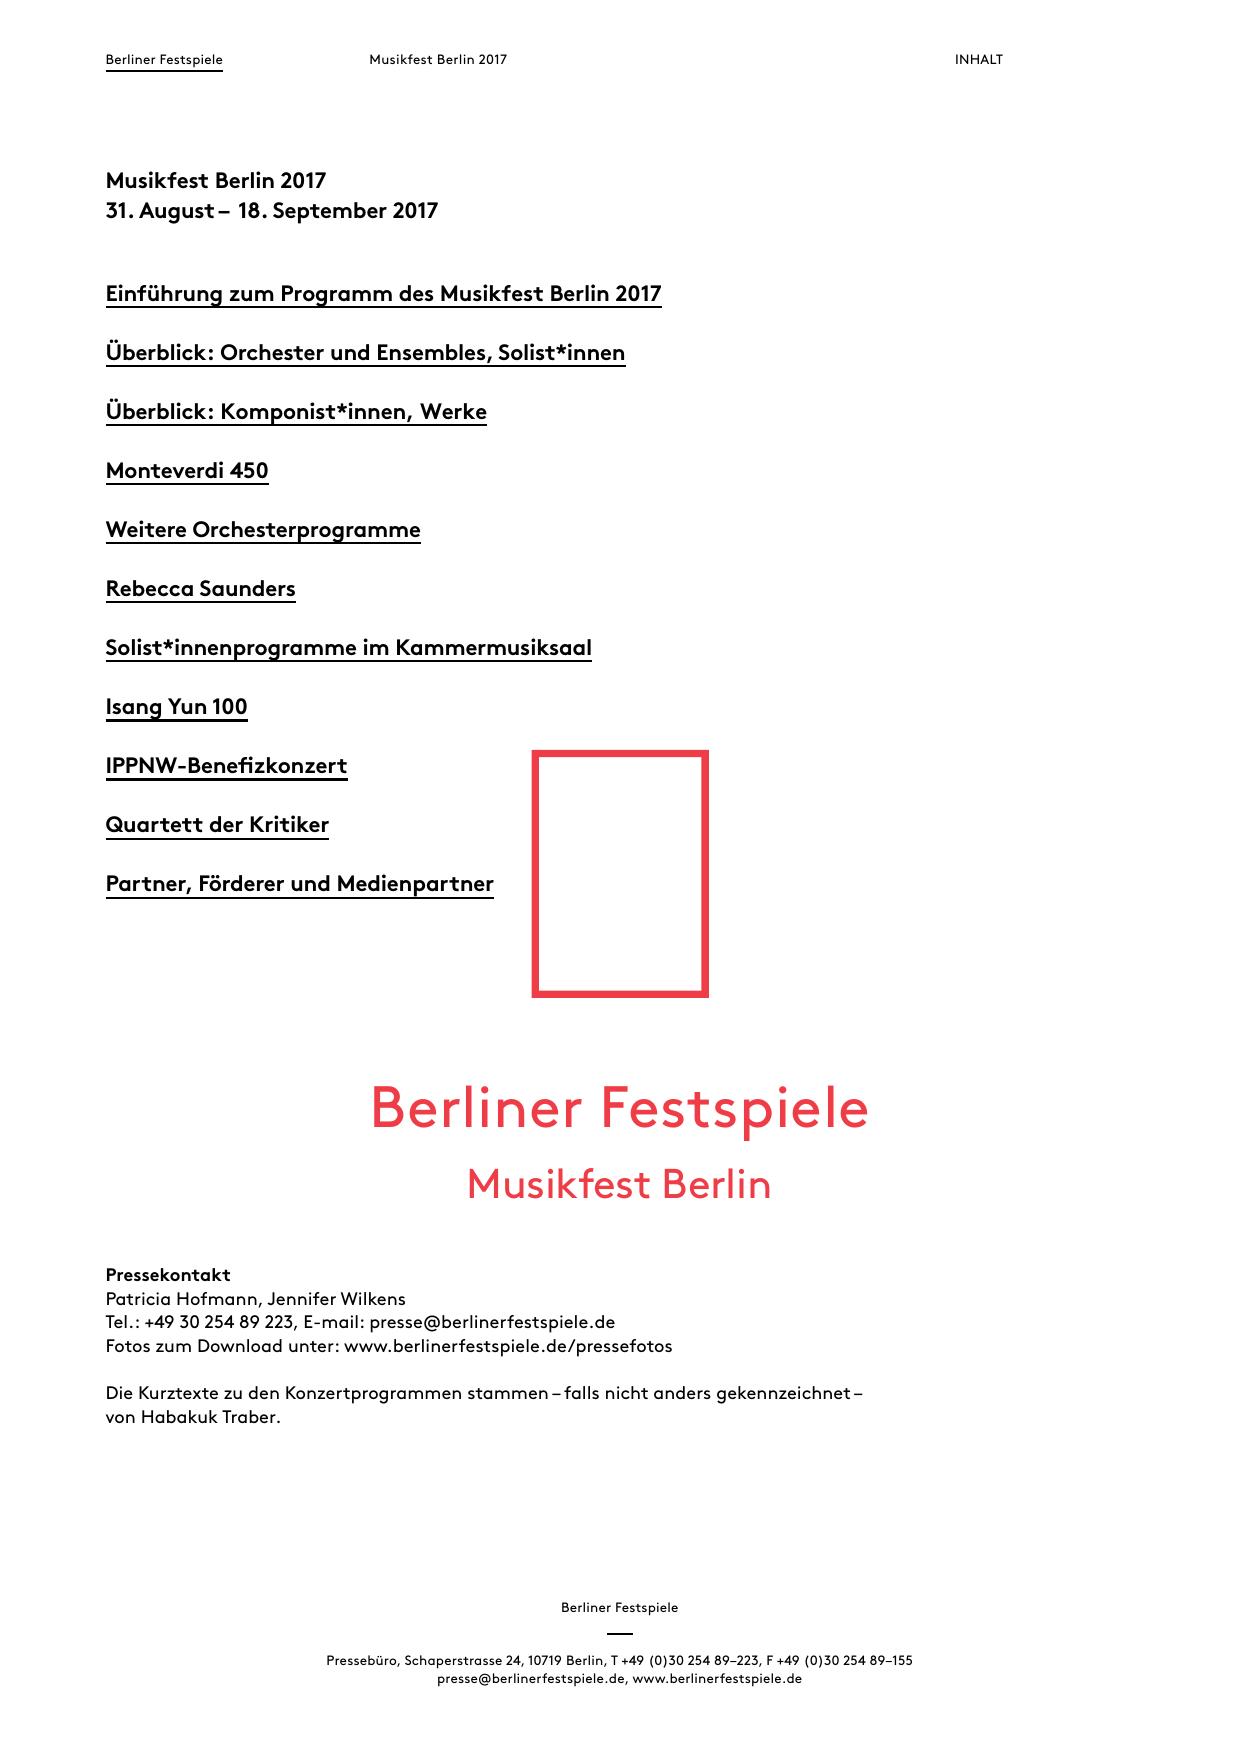 Rebecca Saunders Berliner Festspiele